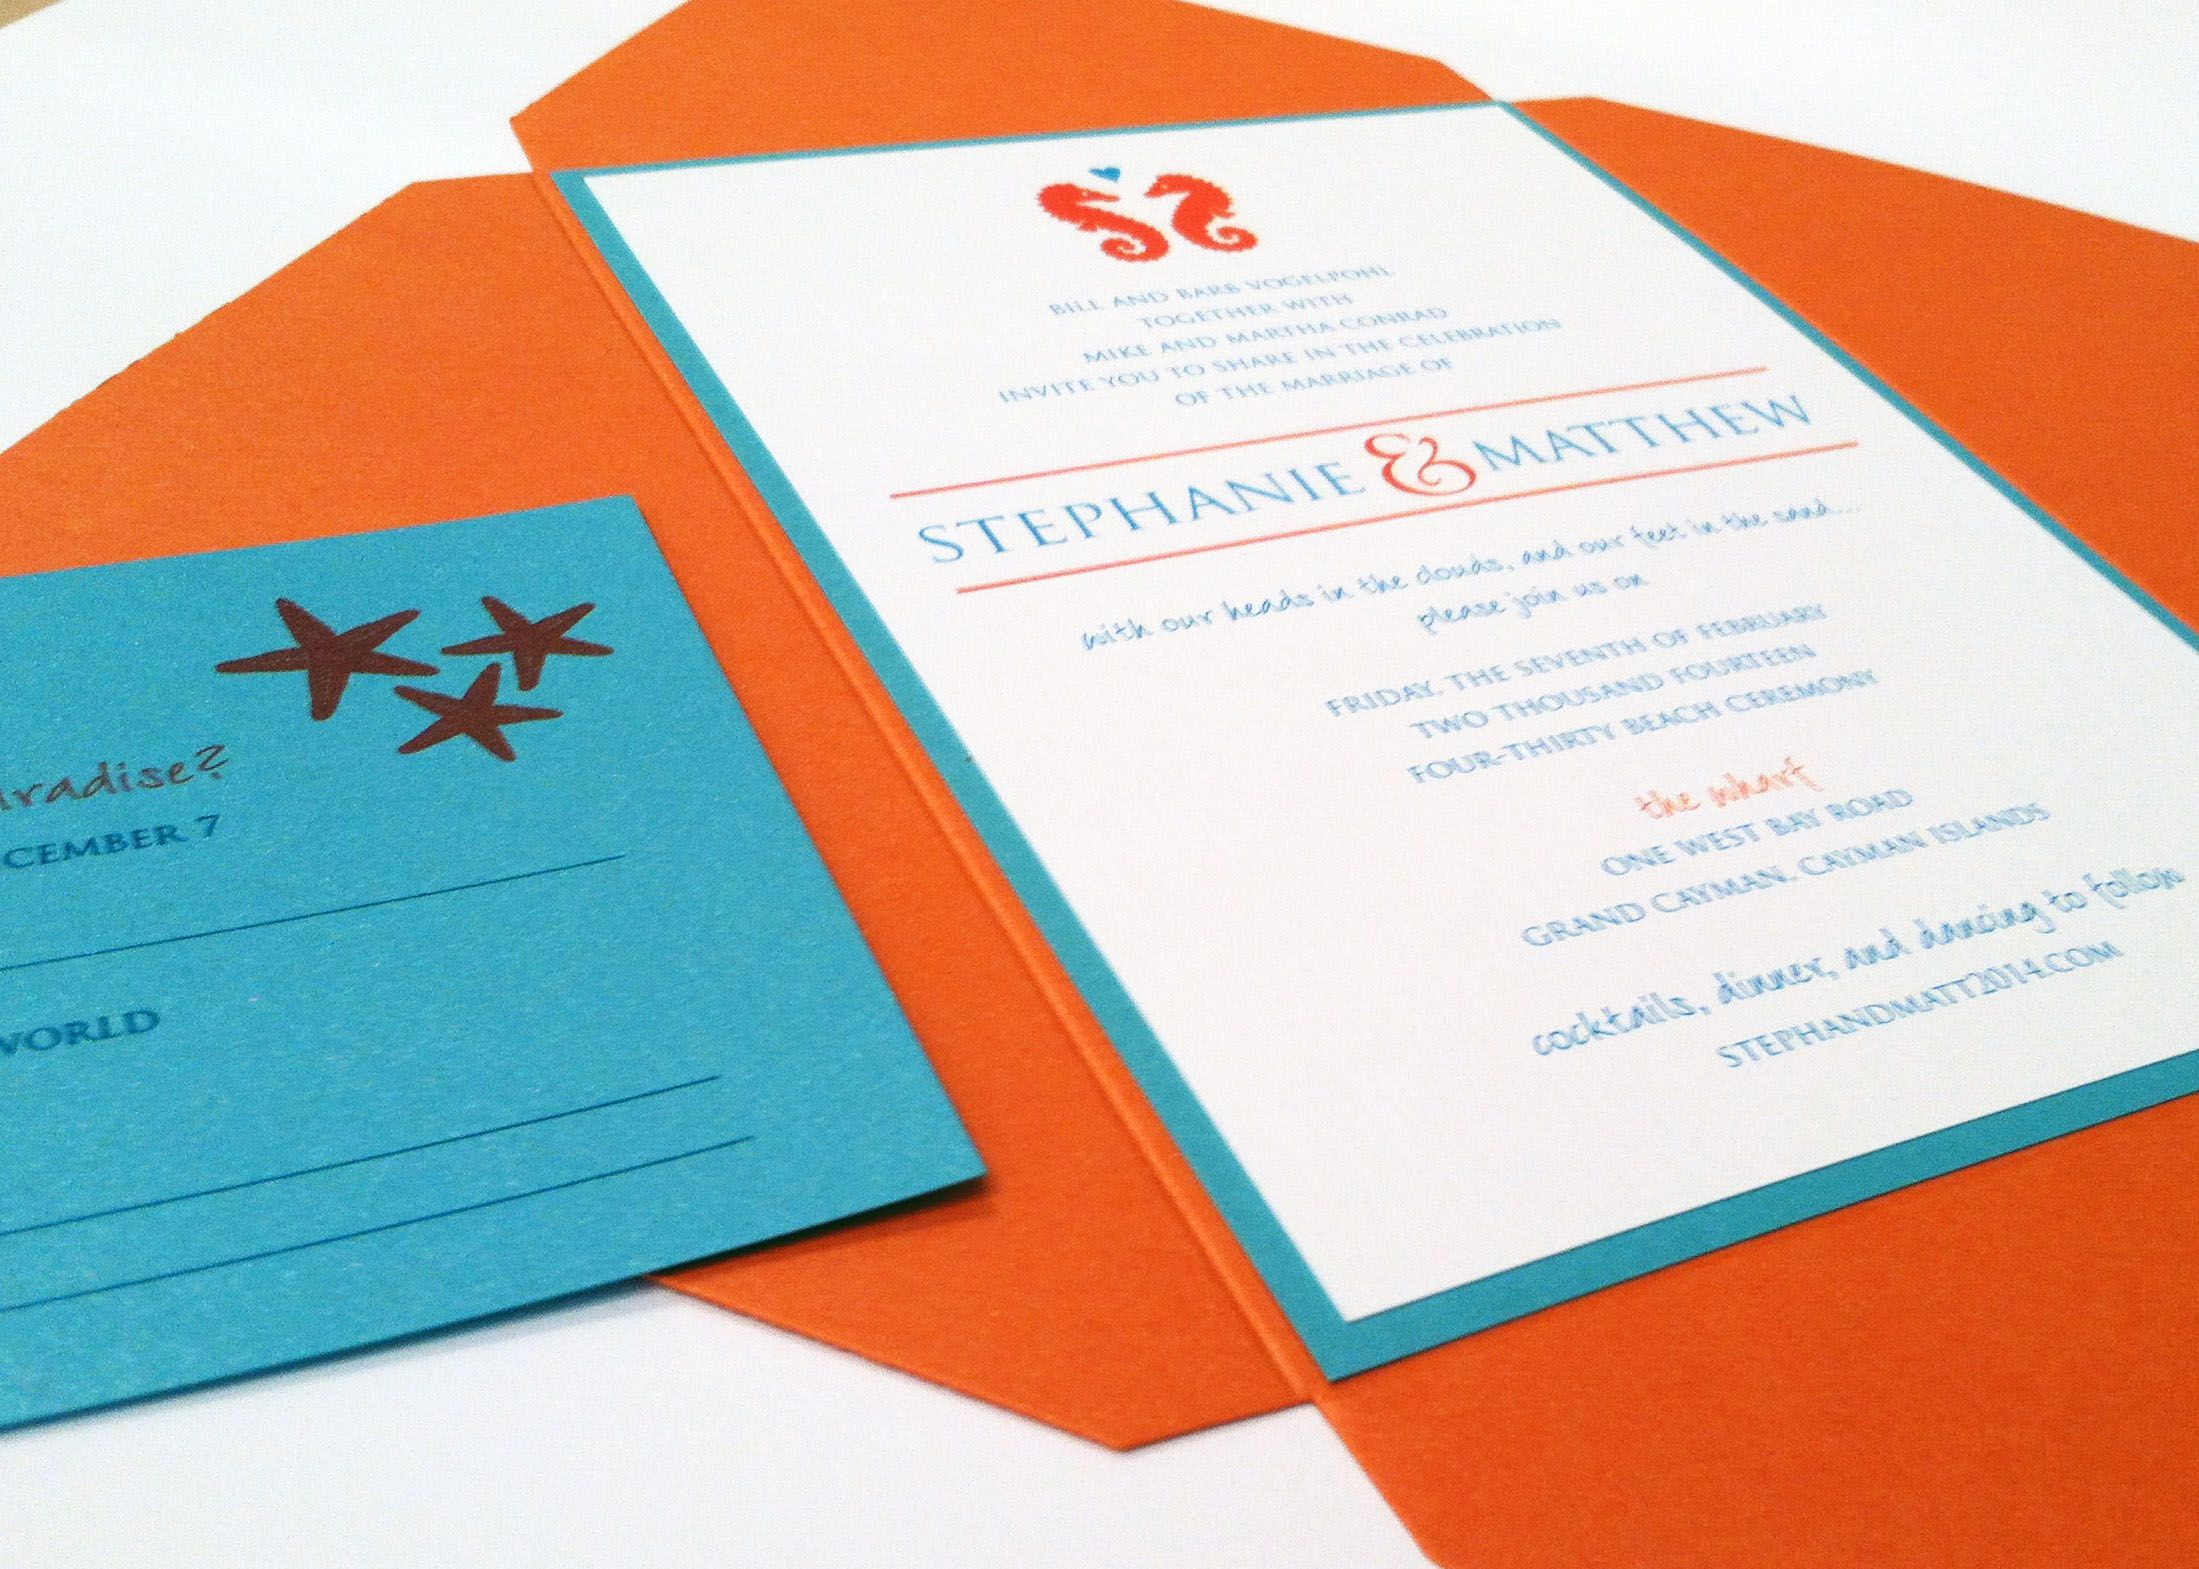 Beach wedding invitation with seahorse and starfish graphics ...